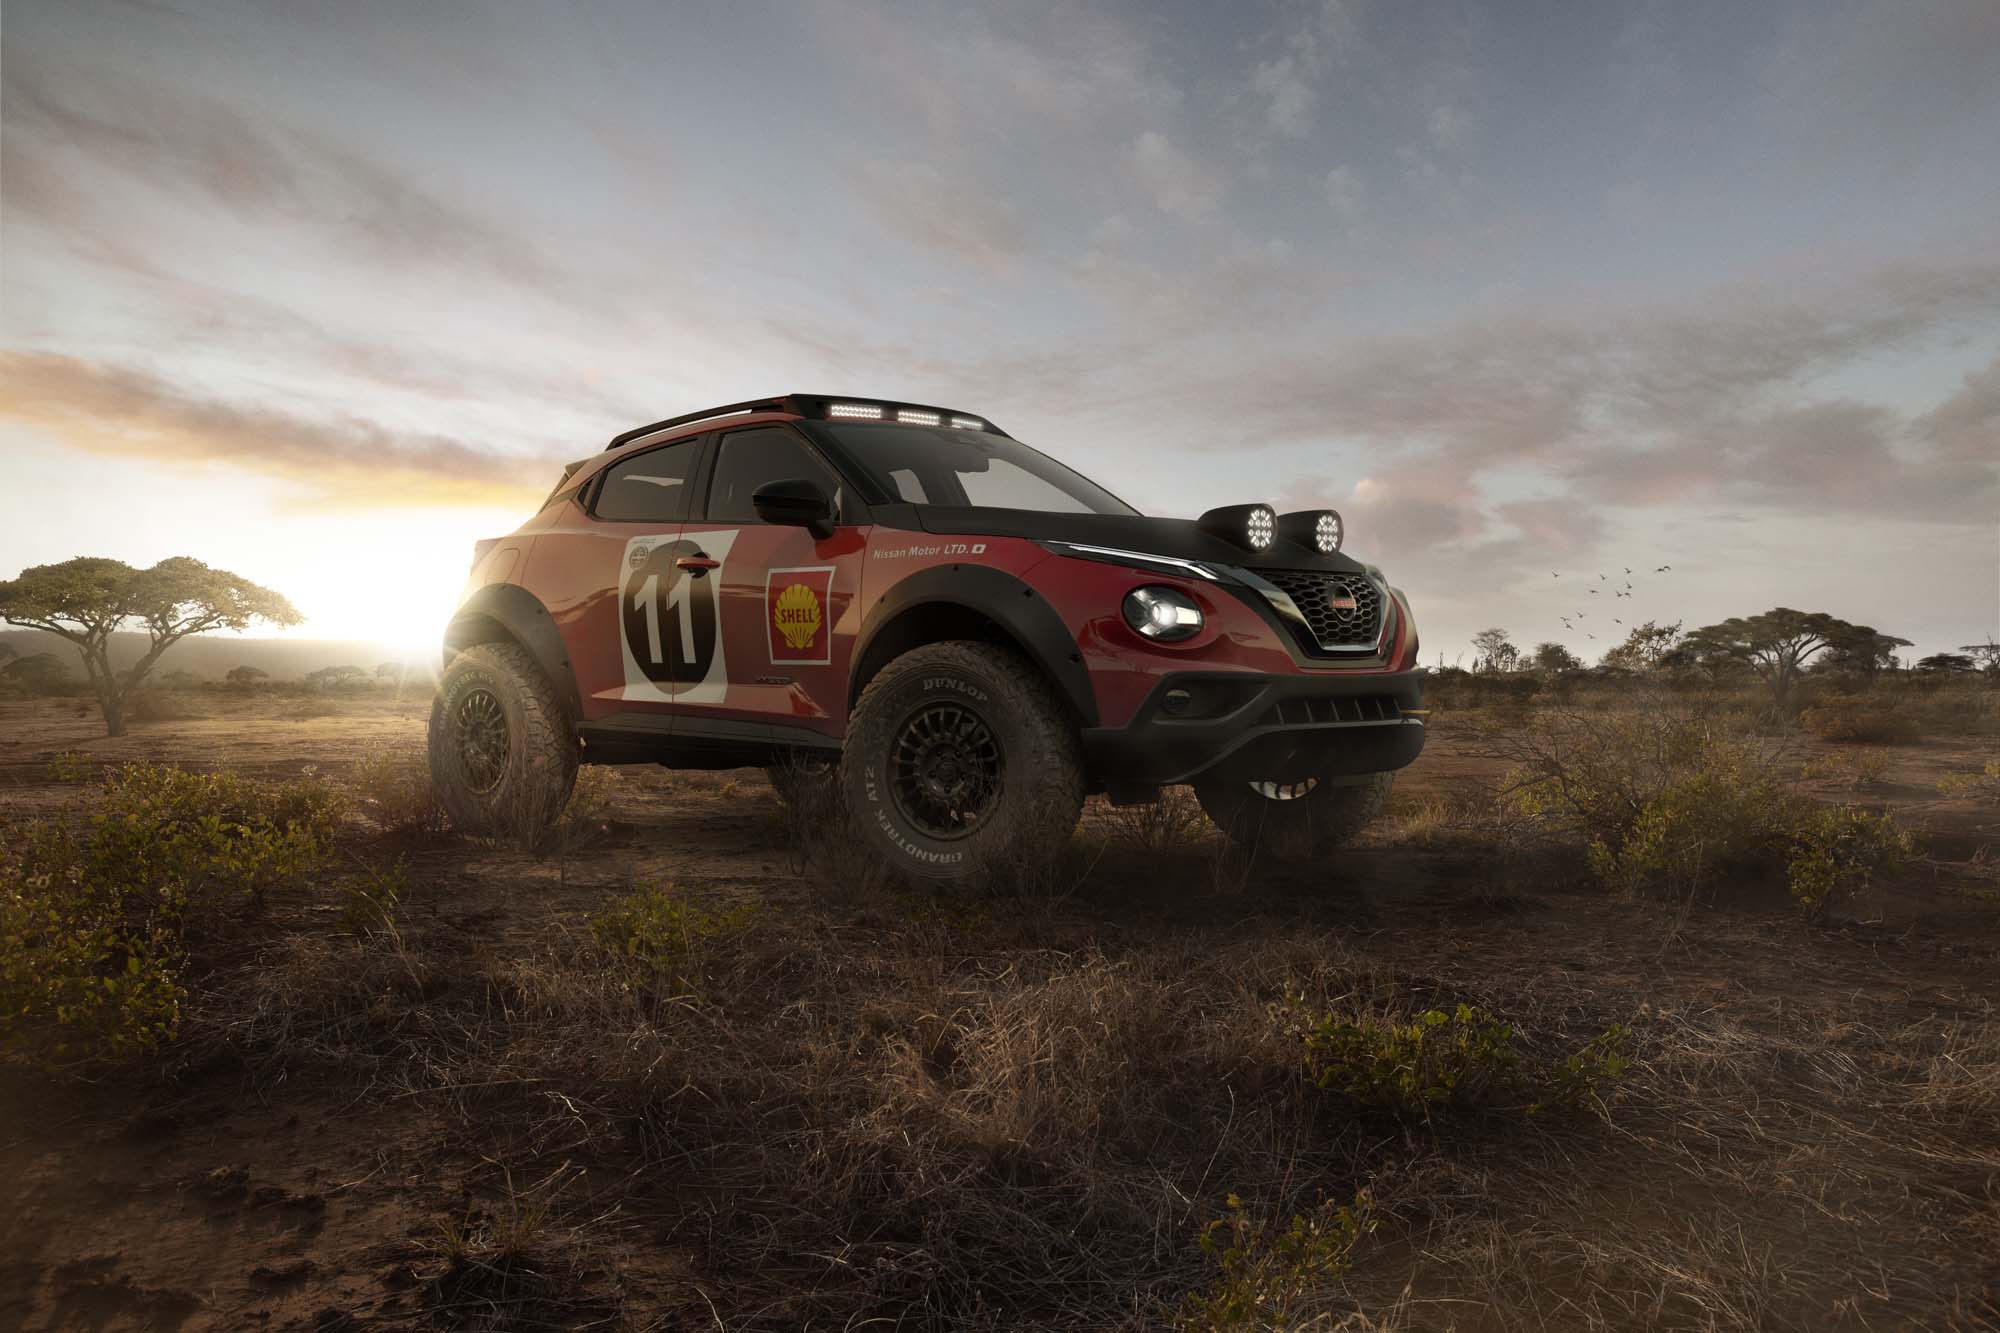 JUKE Rally Heritage Concept 7 Πώς σου φαίνεται αυτό το Nissan Juke Rally; Nissan, Nissan Juke, zblog, ειδήσεις, Νέα